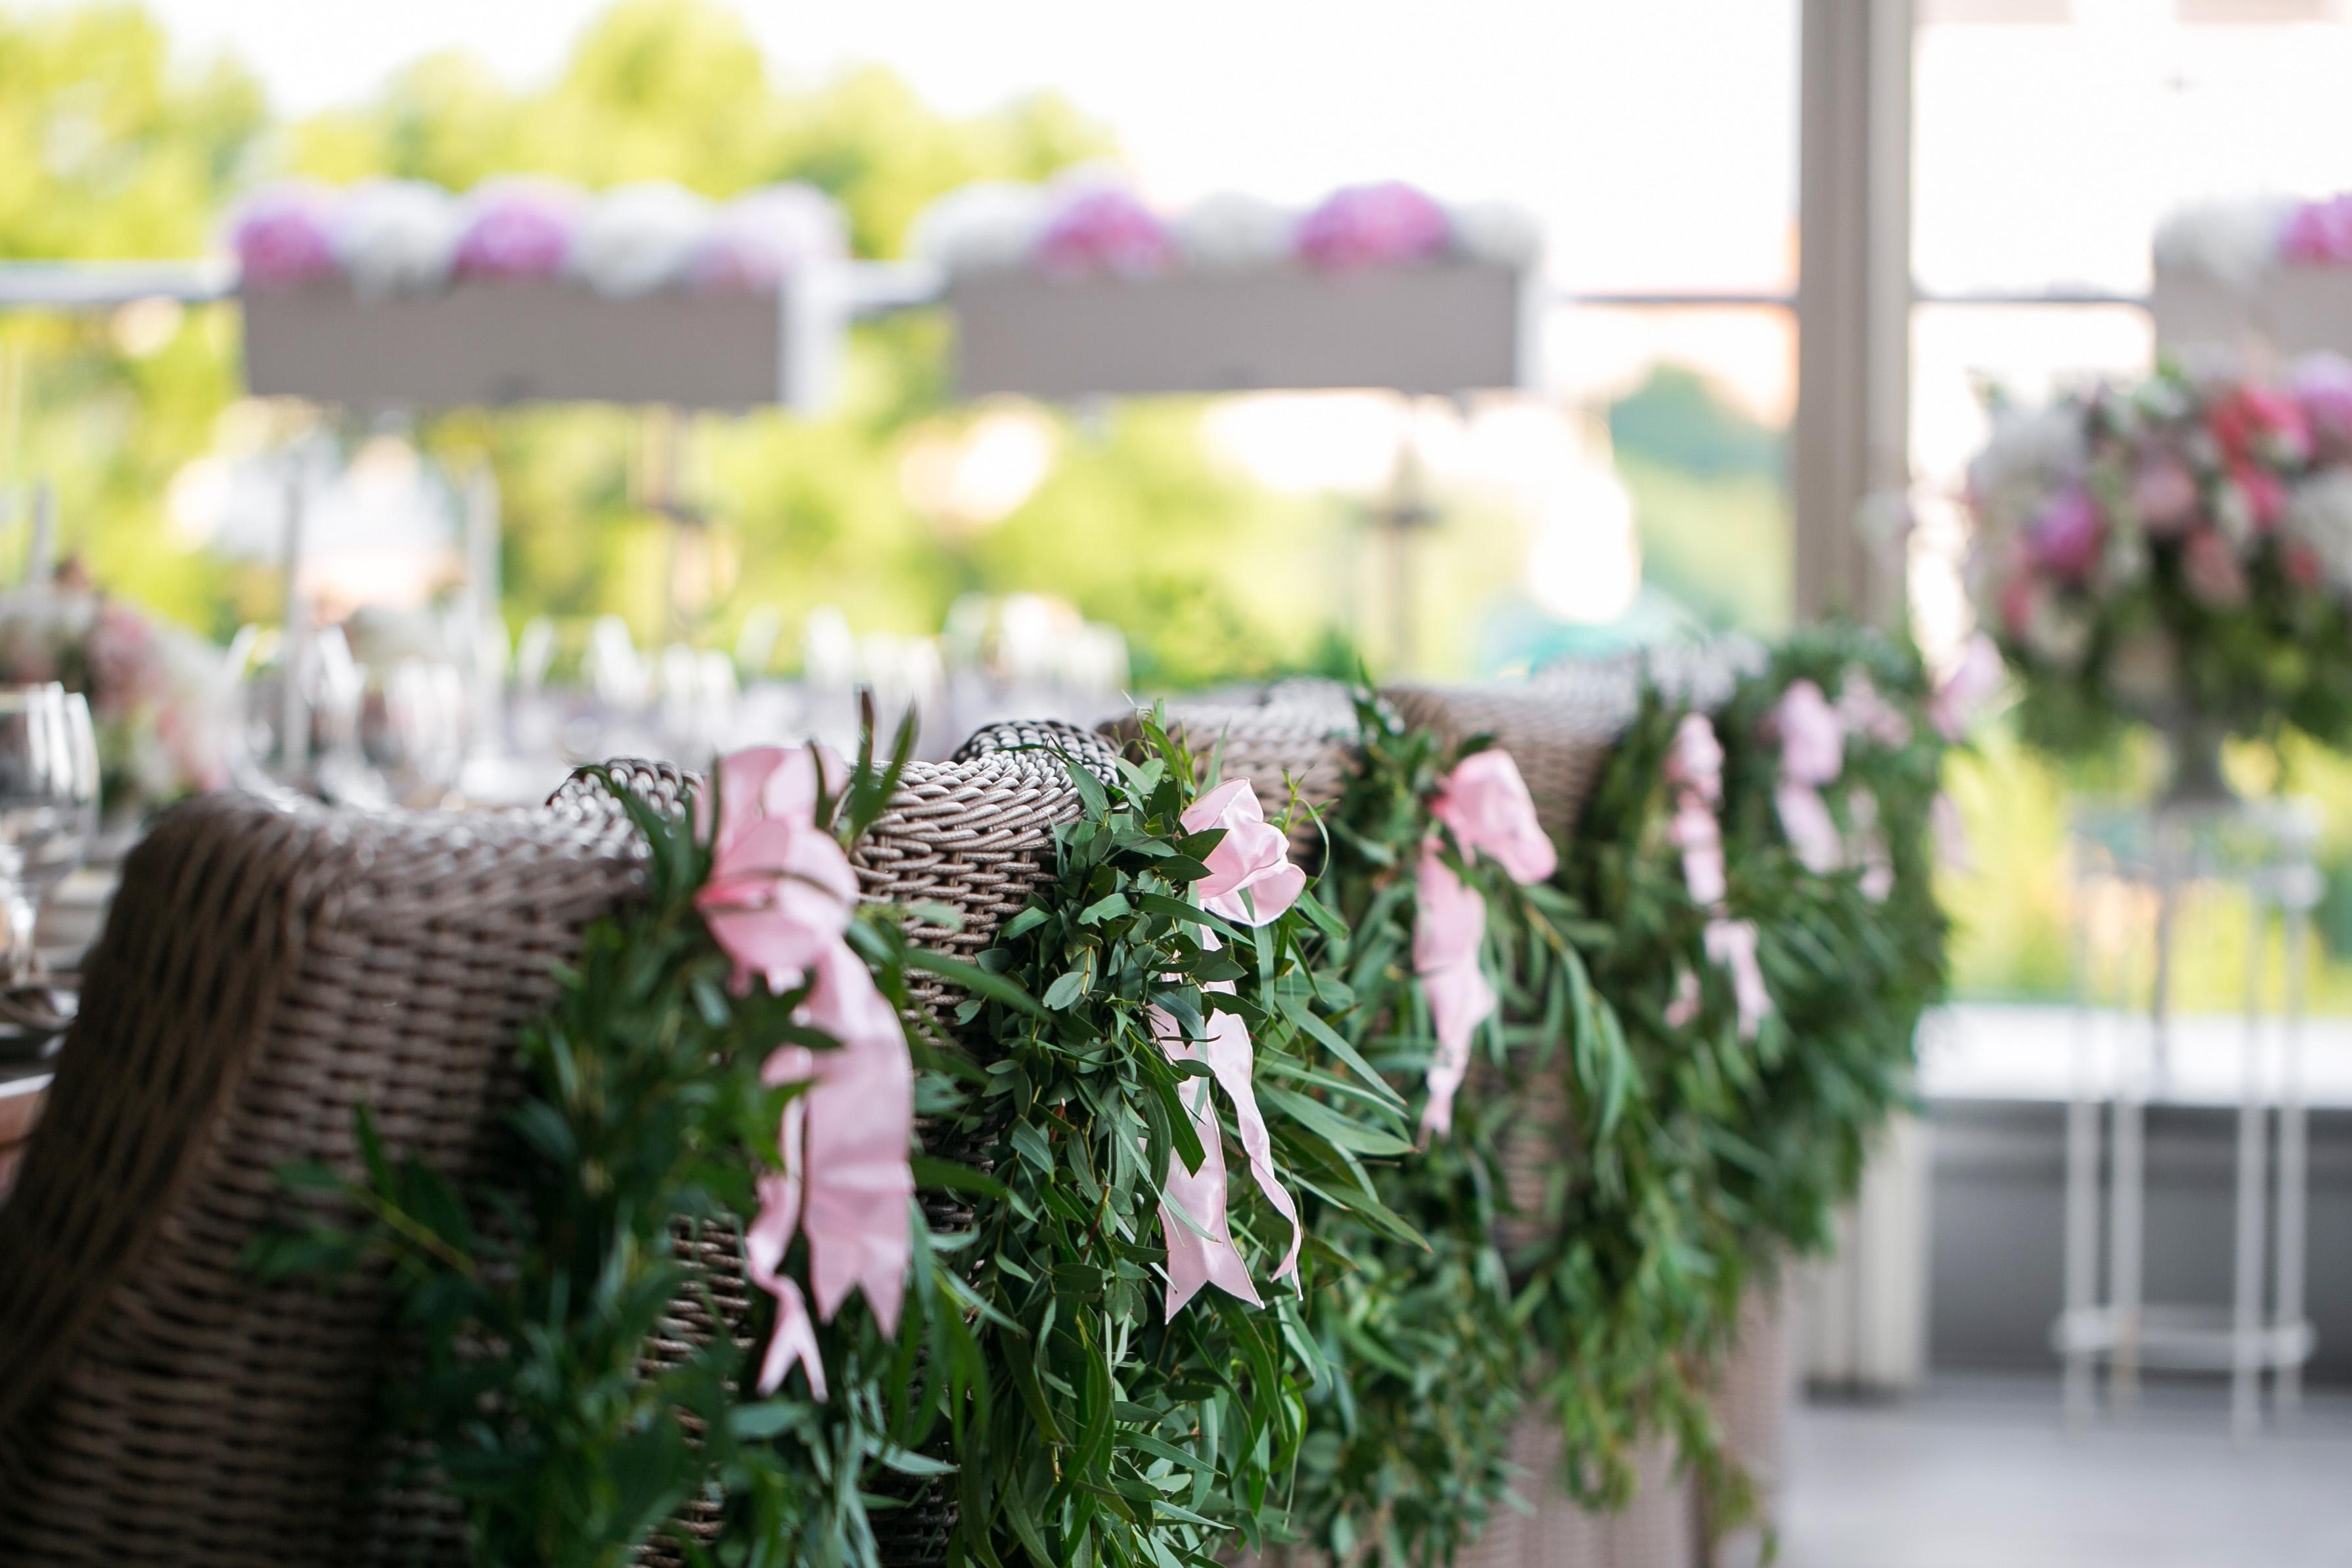 Make Happy Memories Greenery Seat Wreath